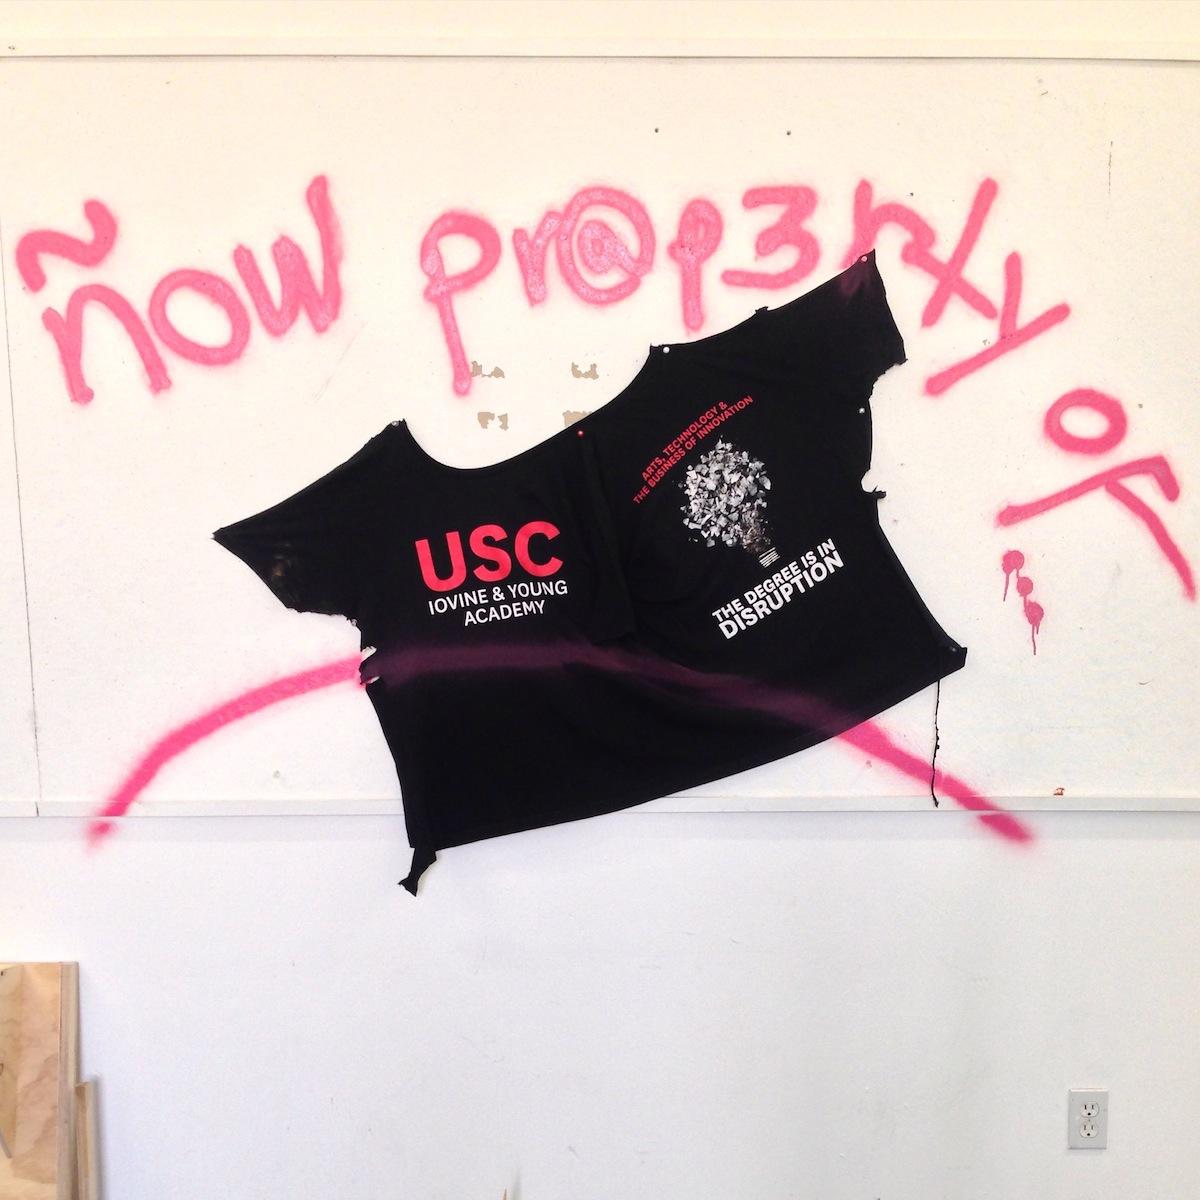 USC Roski Graduate Fine Arts building (Photo Credit: Jacinto Astiazarán)